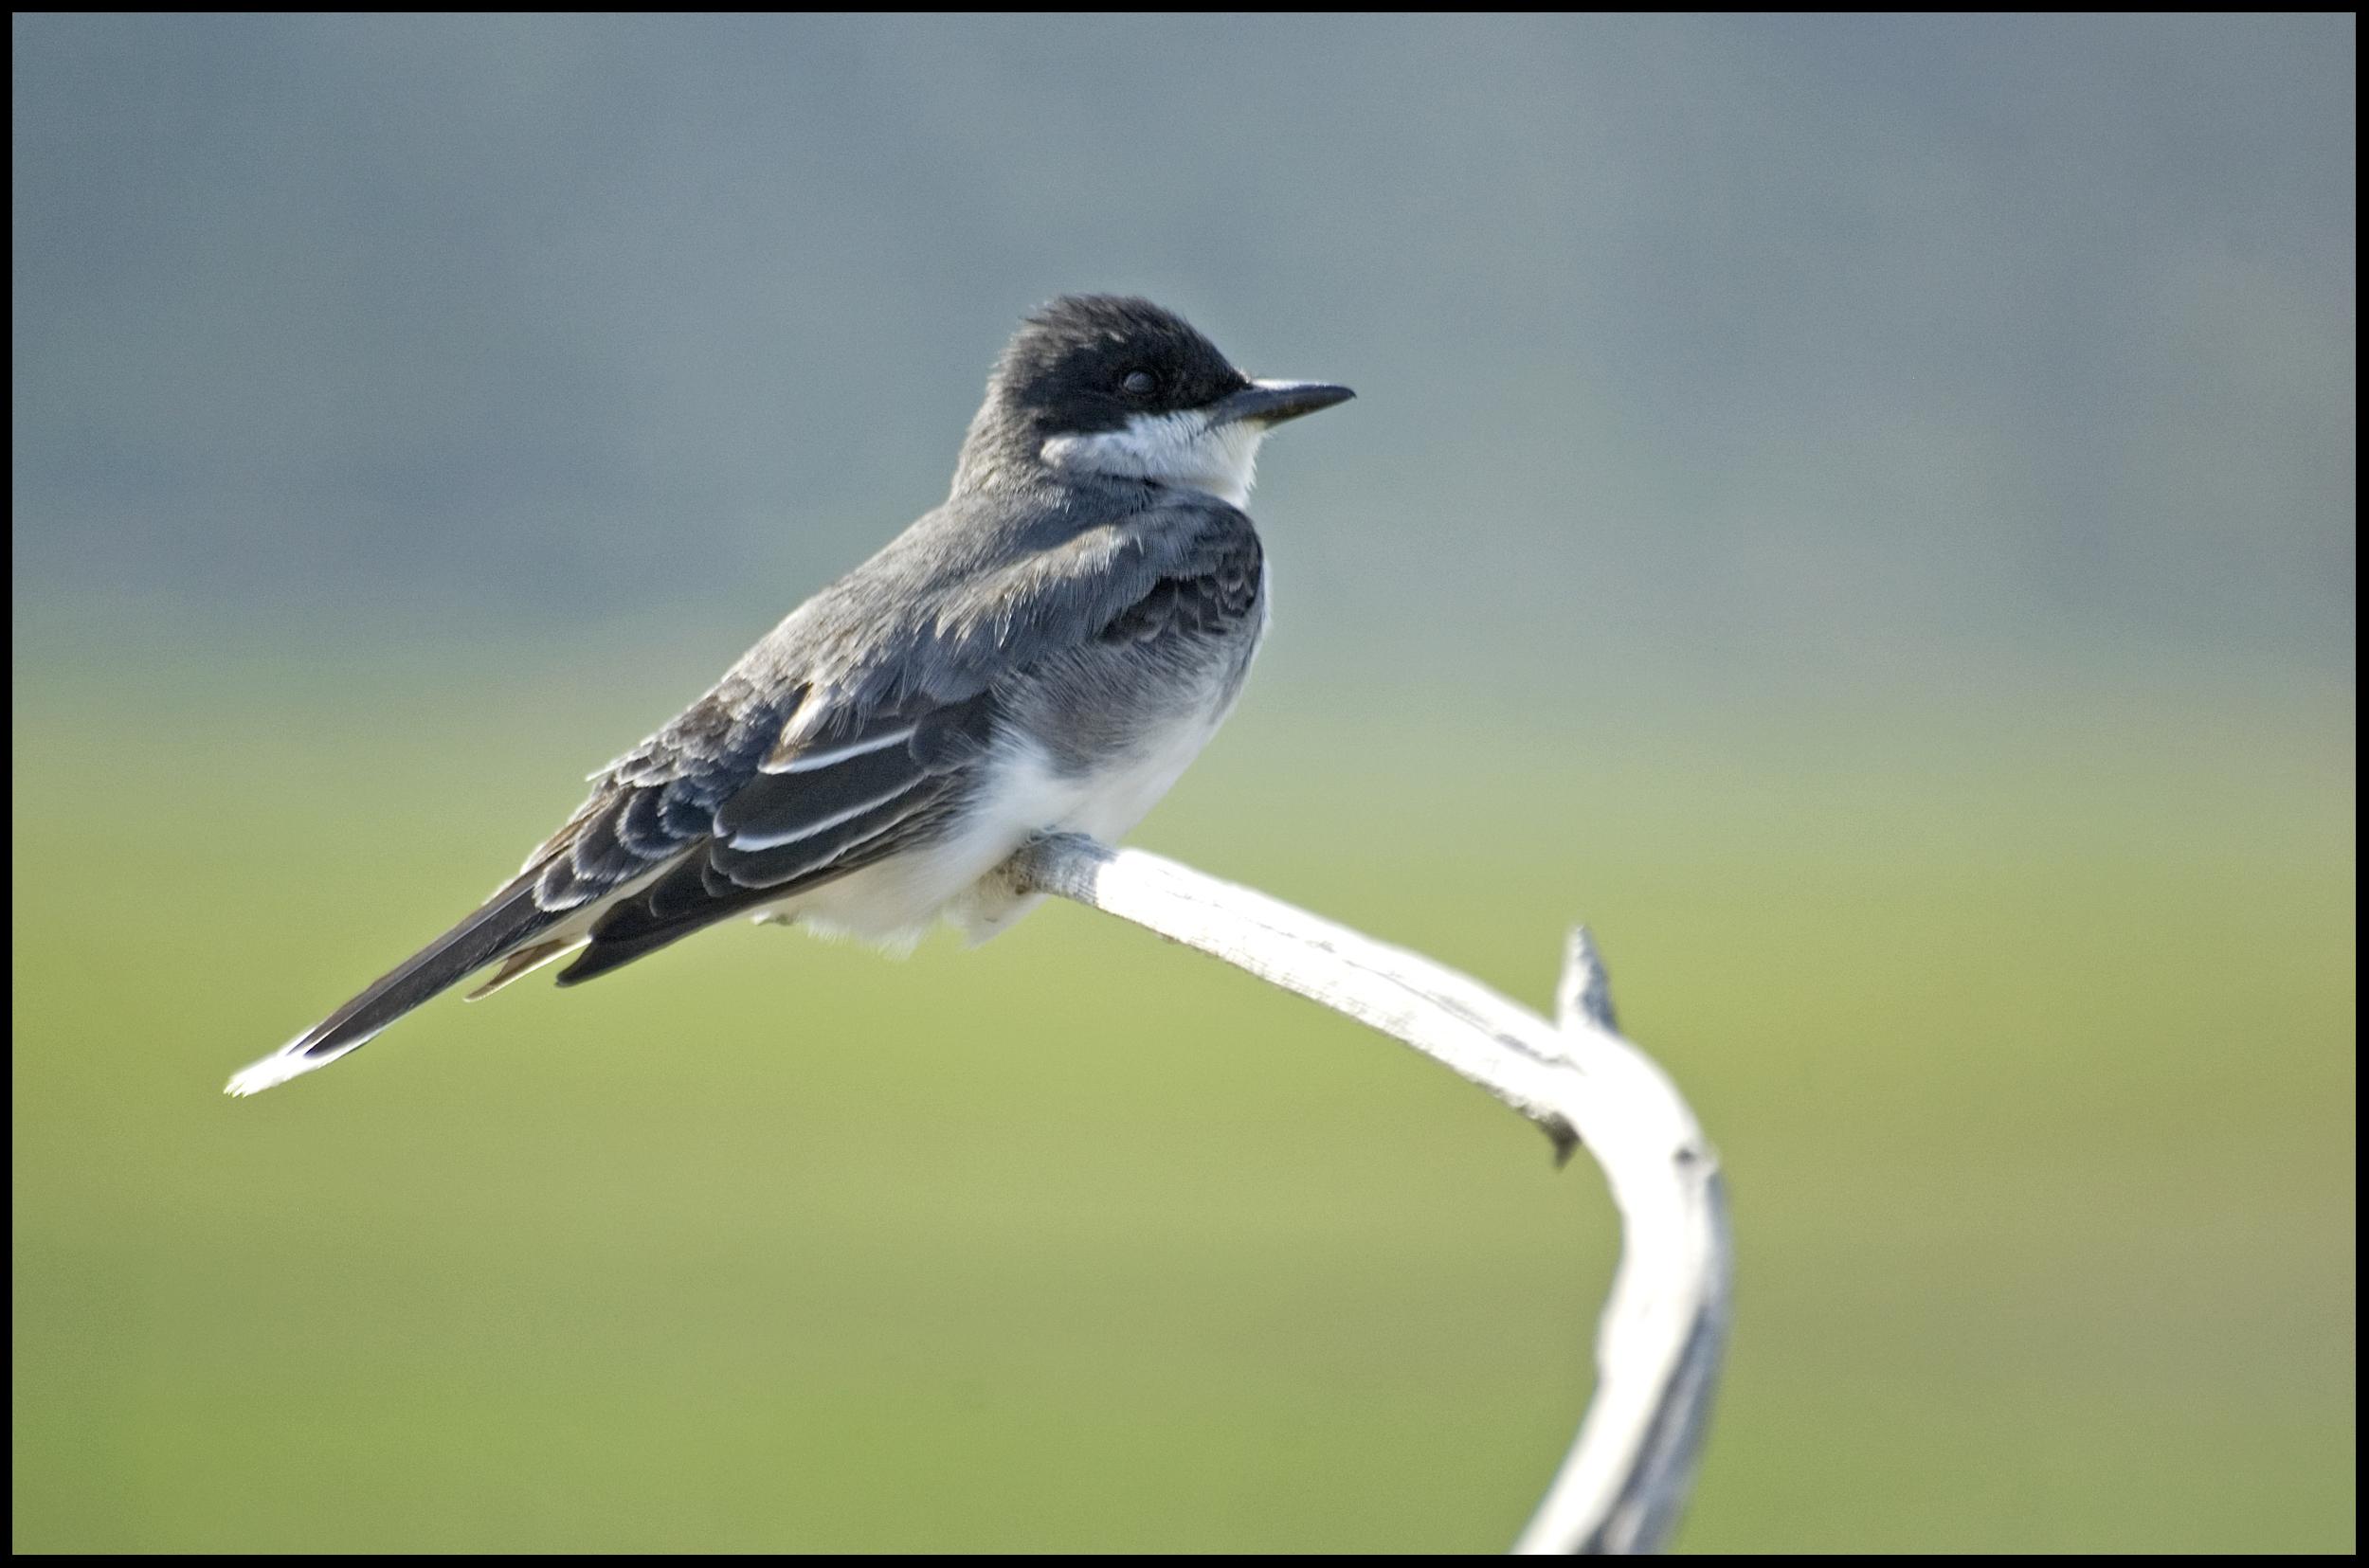 Eastern Kingbird, Malheur National Wildlife Refuge, OR